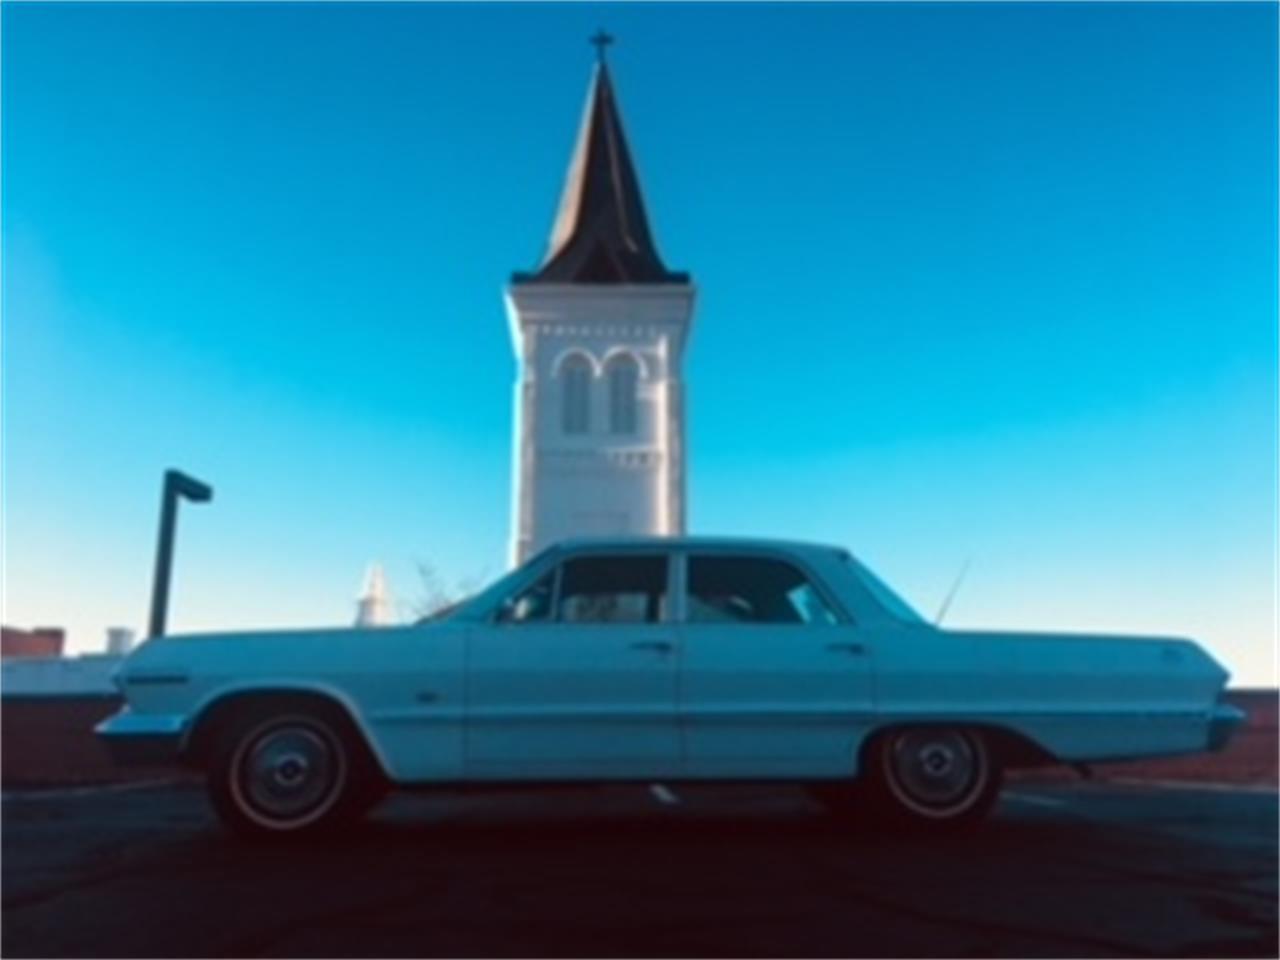 Large Picture of 1963 Impala located in Hampton Cove Alabama - $14,900.00 - ME1X